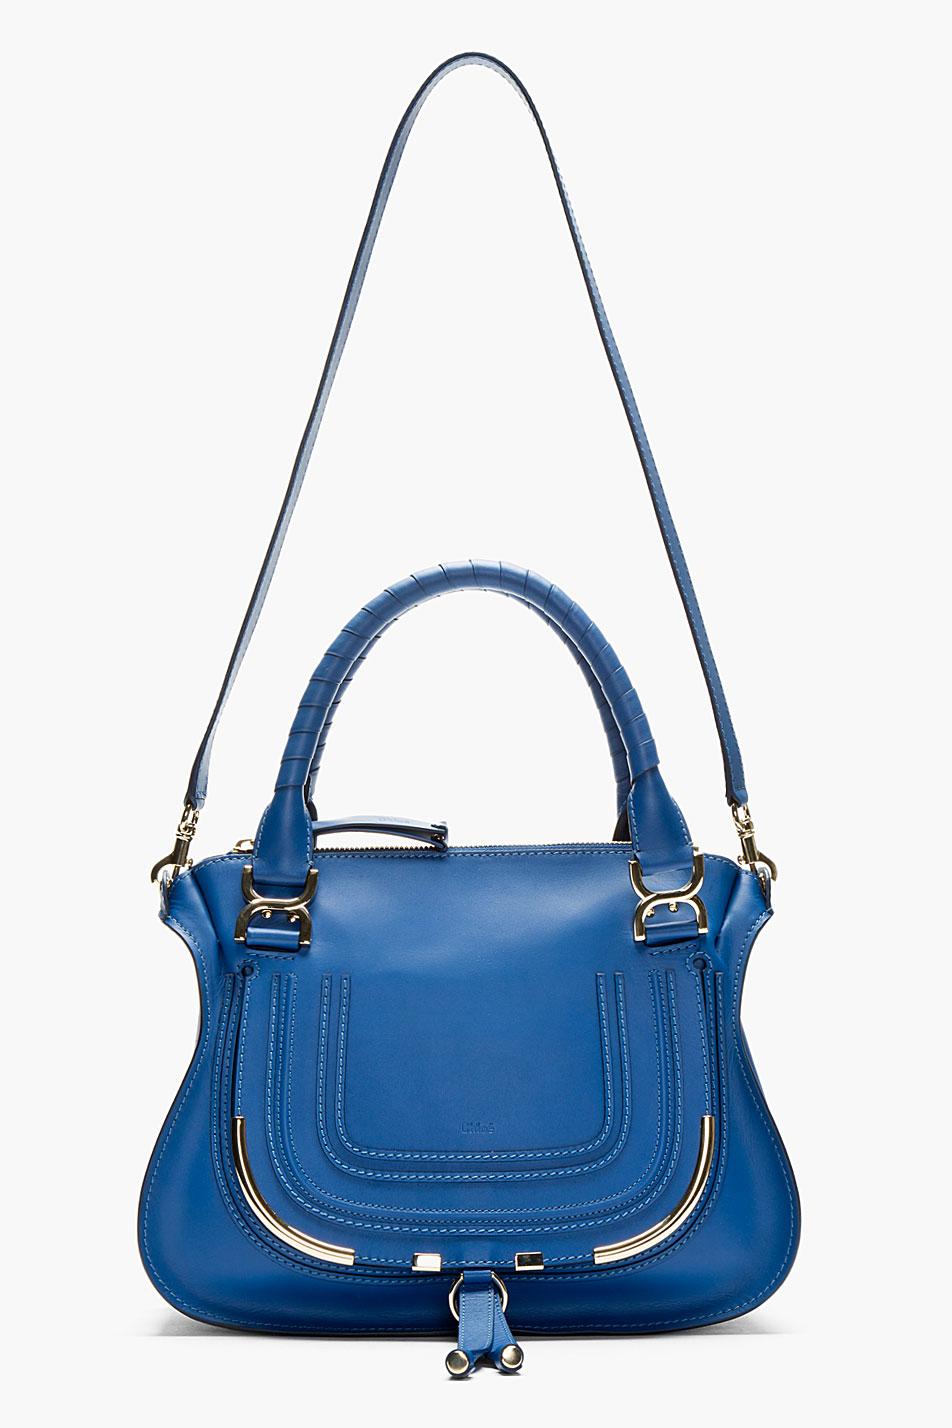 Chlo¨¦ Navy Leather Metal-trimmed Marcie Medium Shoulder Bag in ...